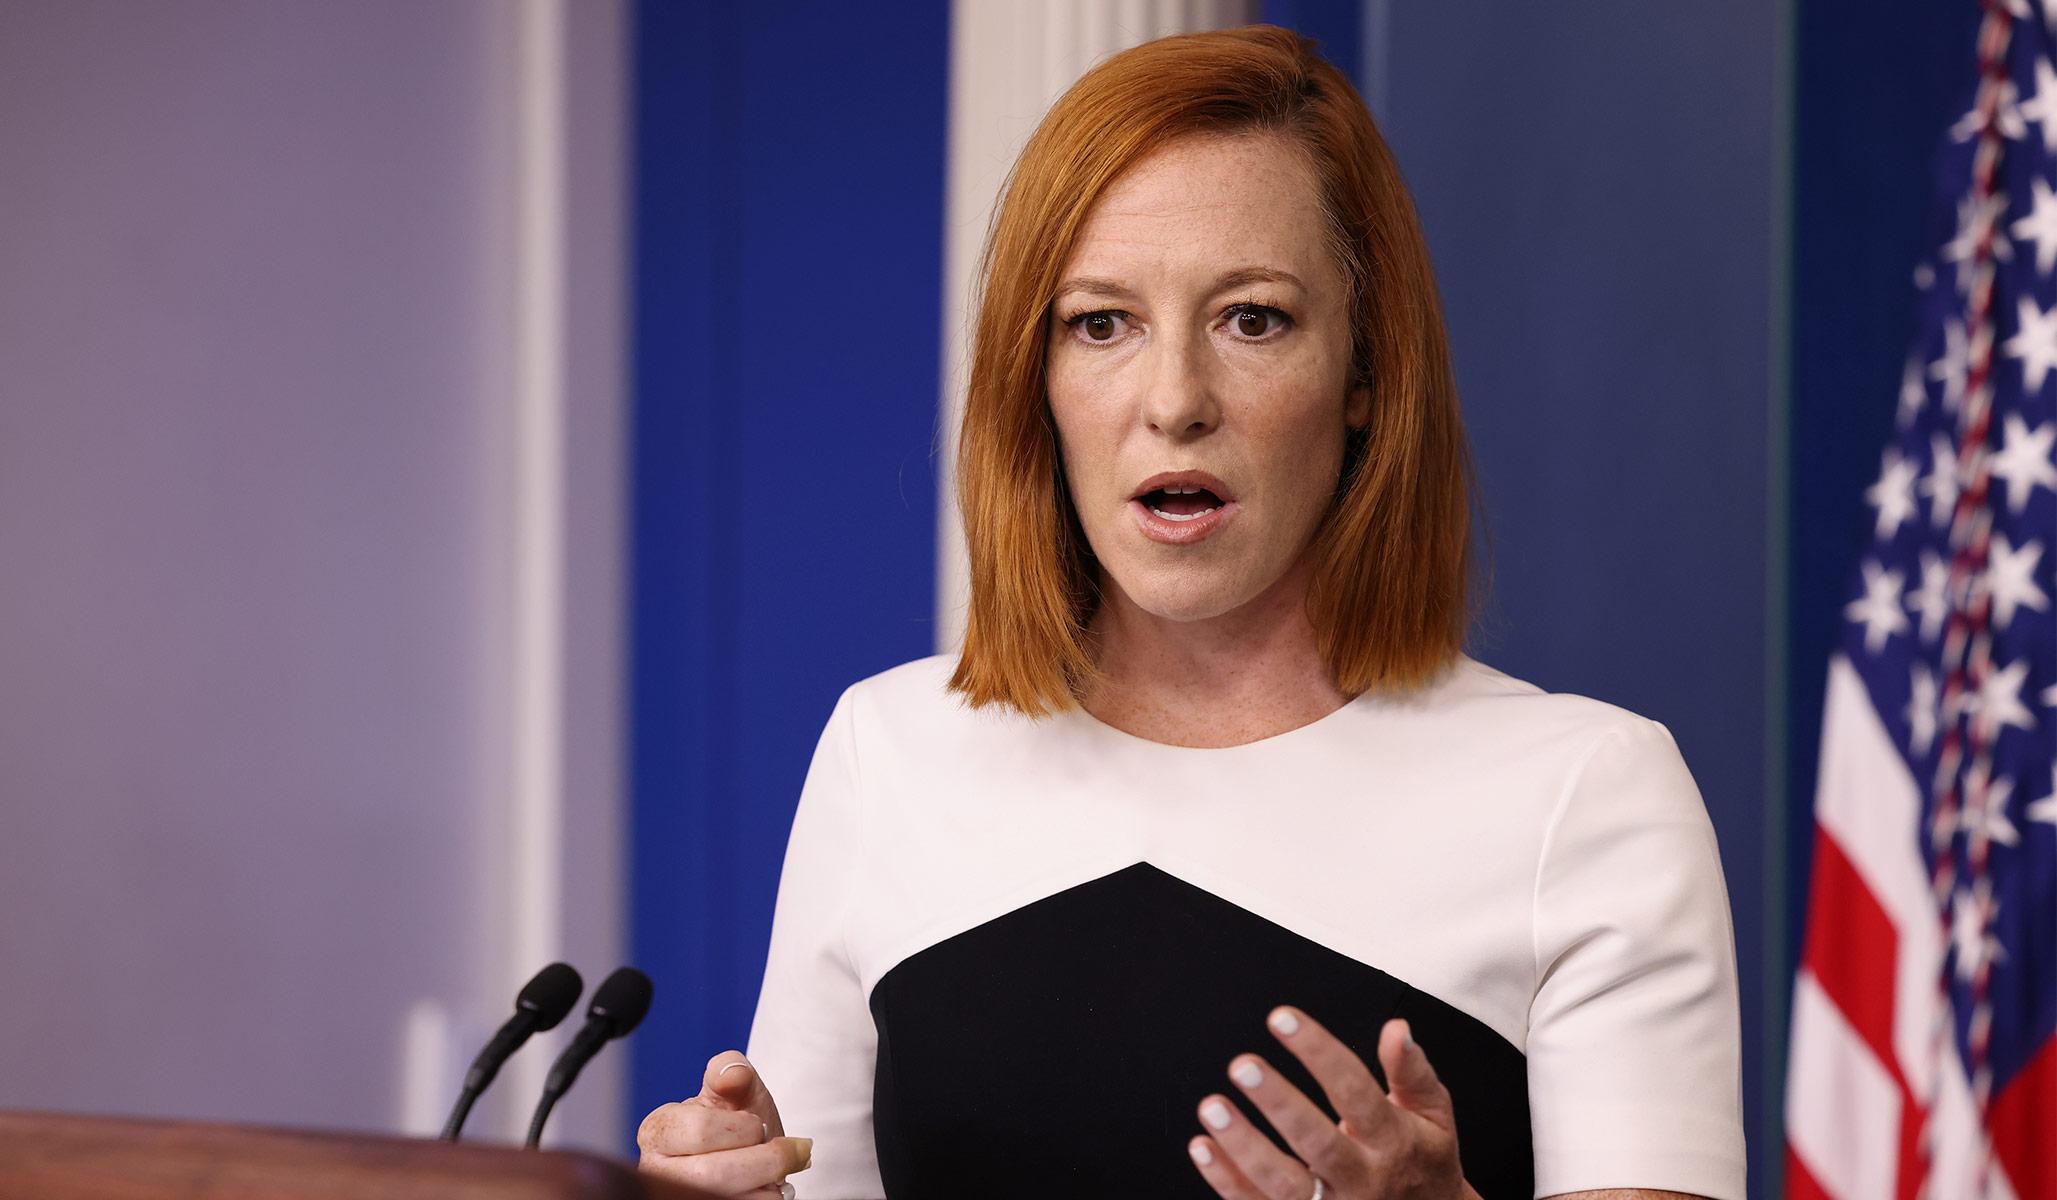 Chris Wallace Commends Jen Psaki: 'One of the Best Press Secretaries Ever'